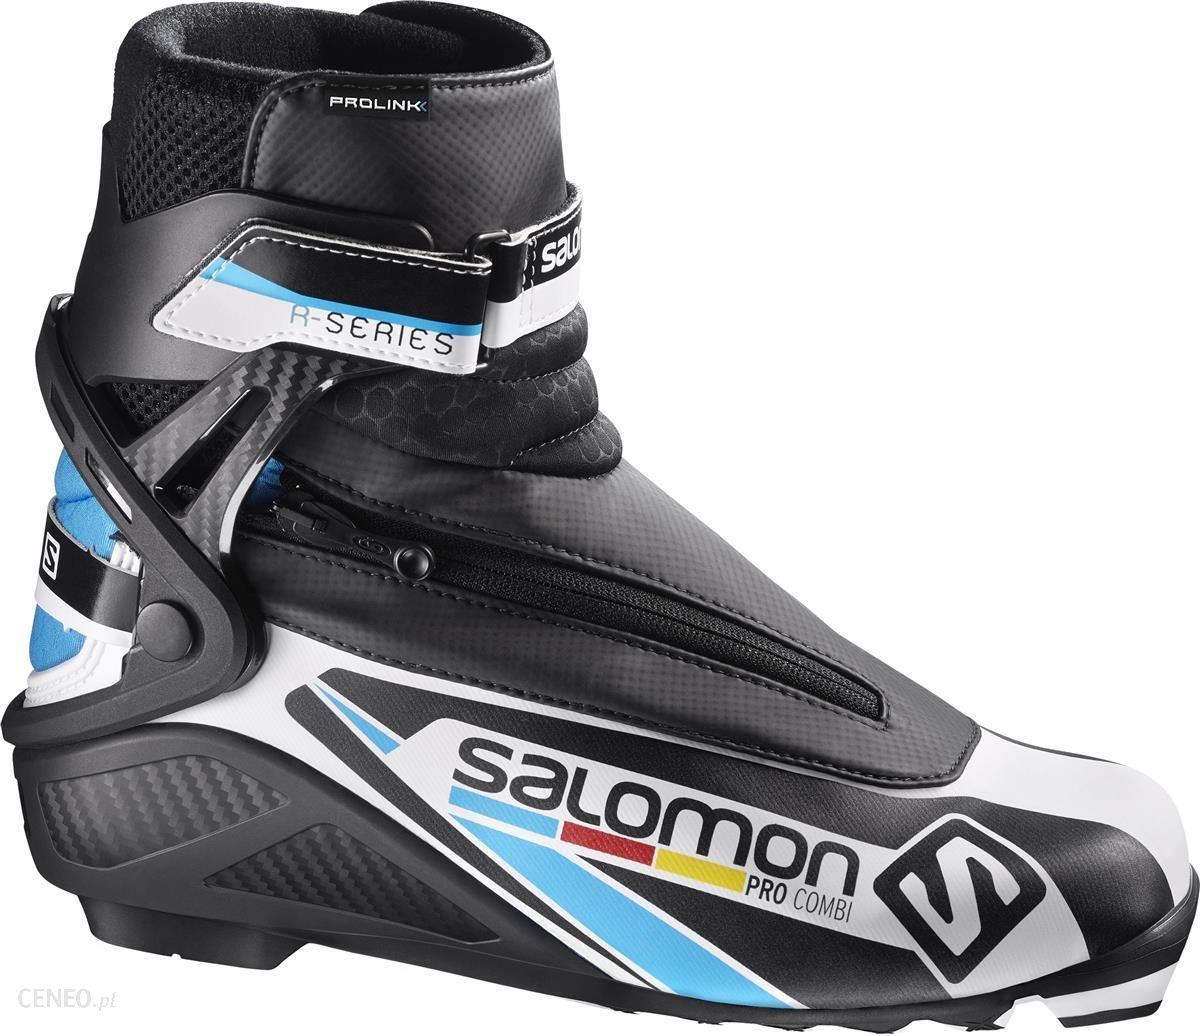 Buty biegowe Salomon Pro Combi